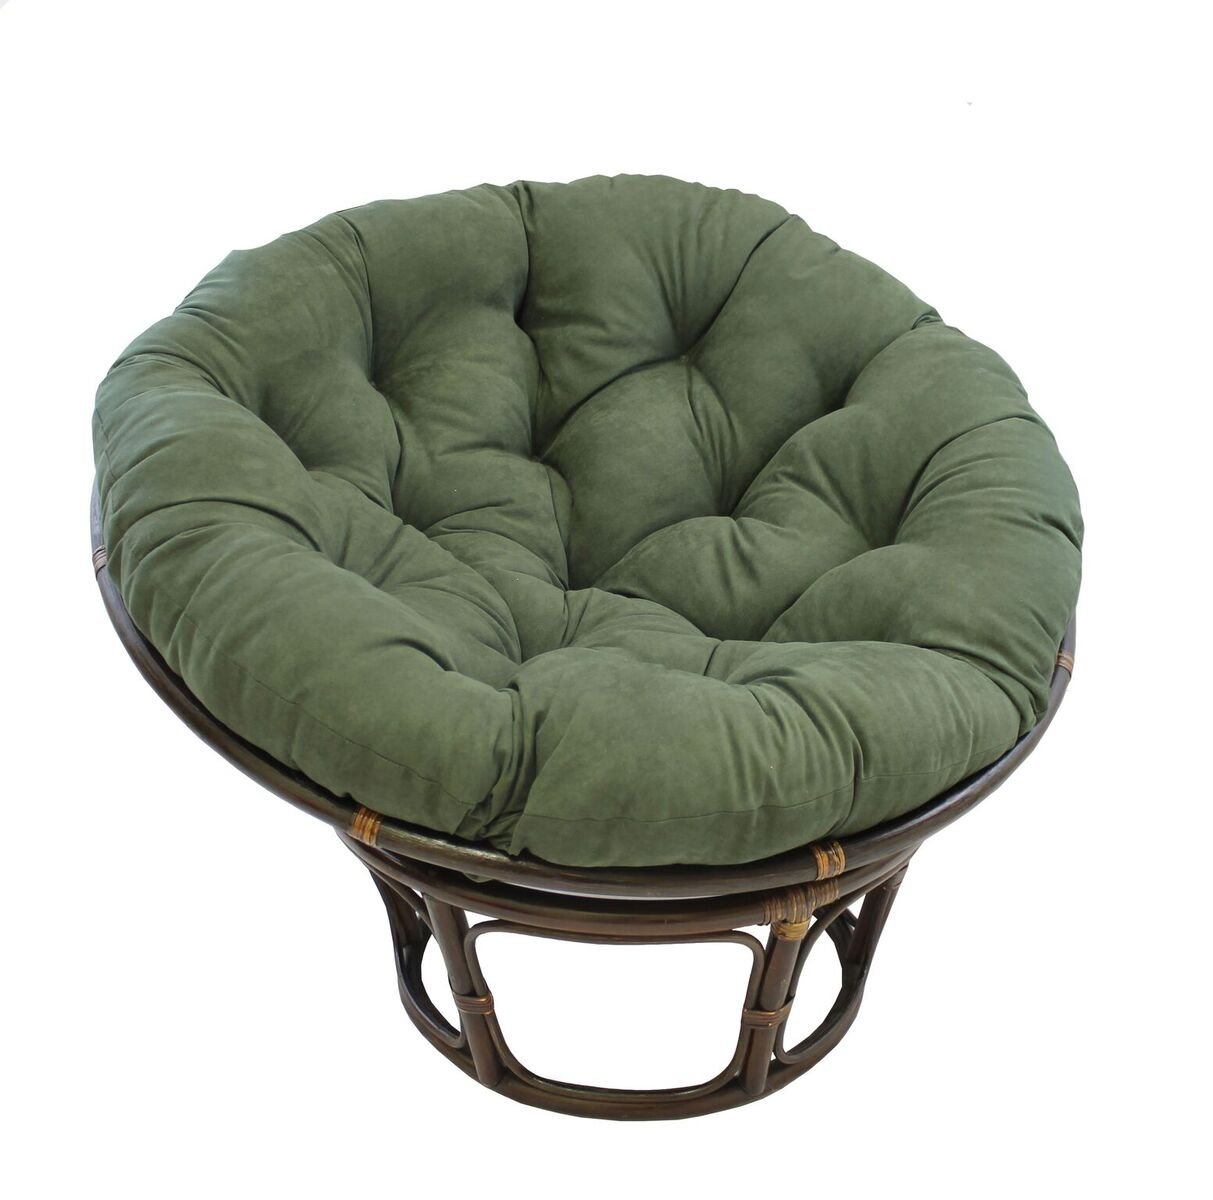 American Rattan Papasan Chair withグリーン100 %ポリエステルクッション – 大人用サイズ   B01CW92Q2G